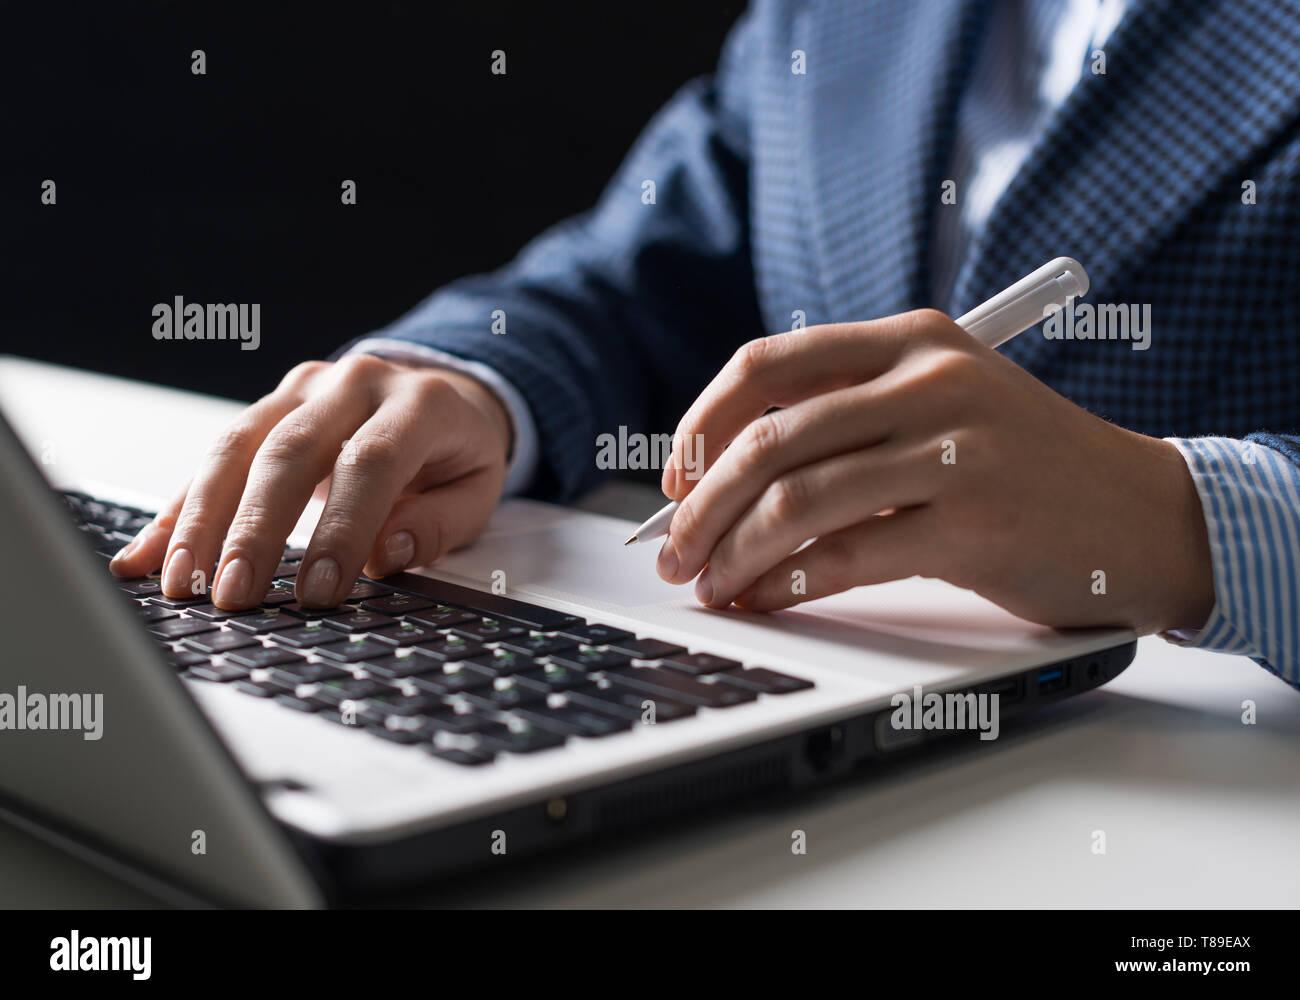 L'homme en costume sitting at desk with laptop Banque D'Images